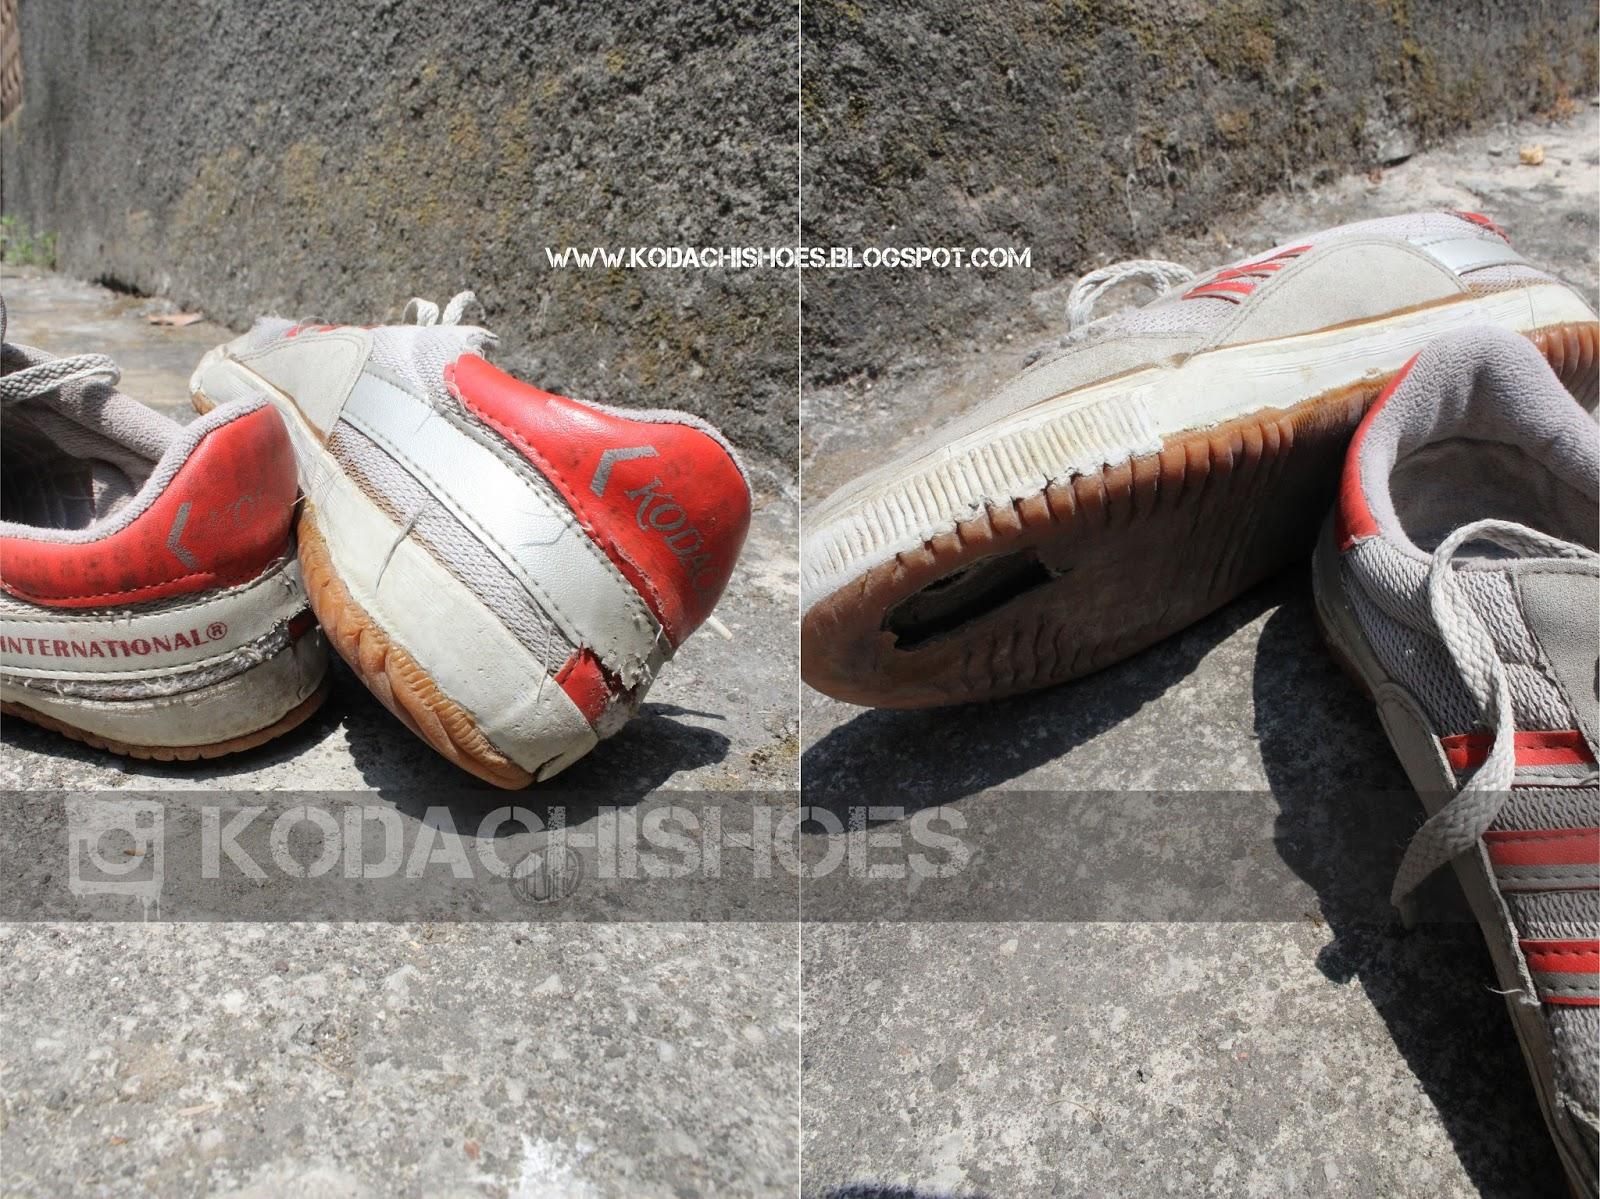 News Kodachi Shoes Sepatu Sport Pemesanan Dan Info Via Sms Whatsapp Telp Ke 0857 1747 8836 Email Kodachishoesshopgmailcom